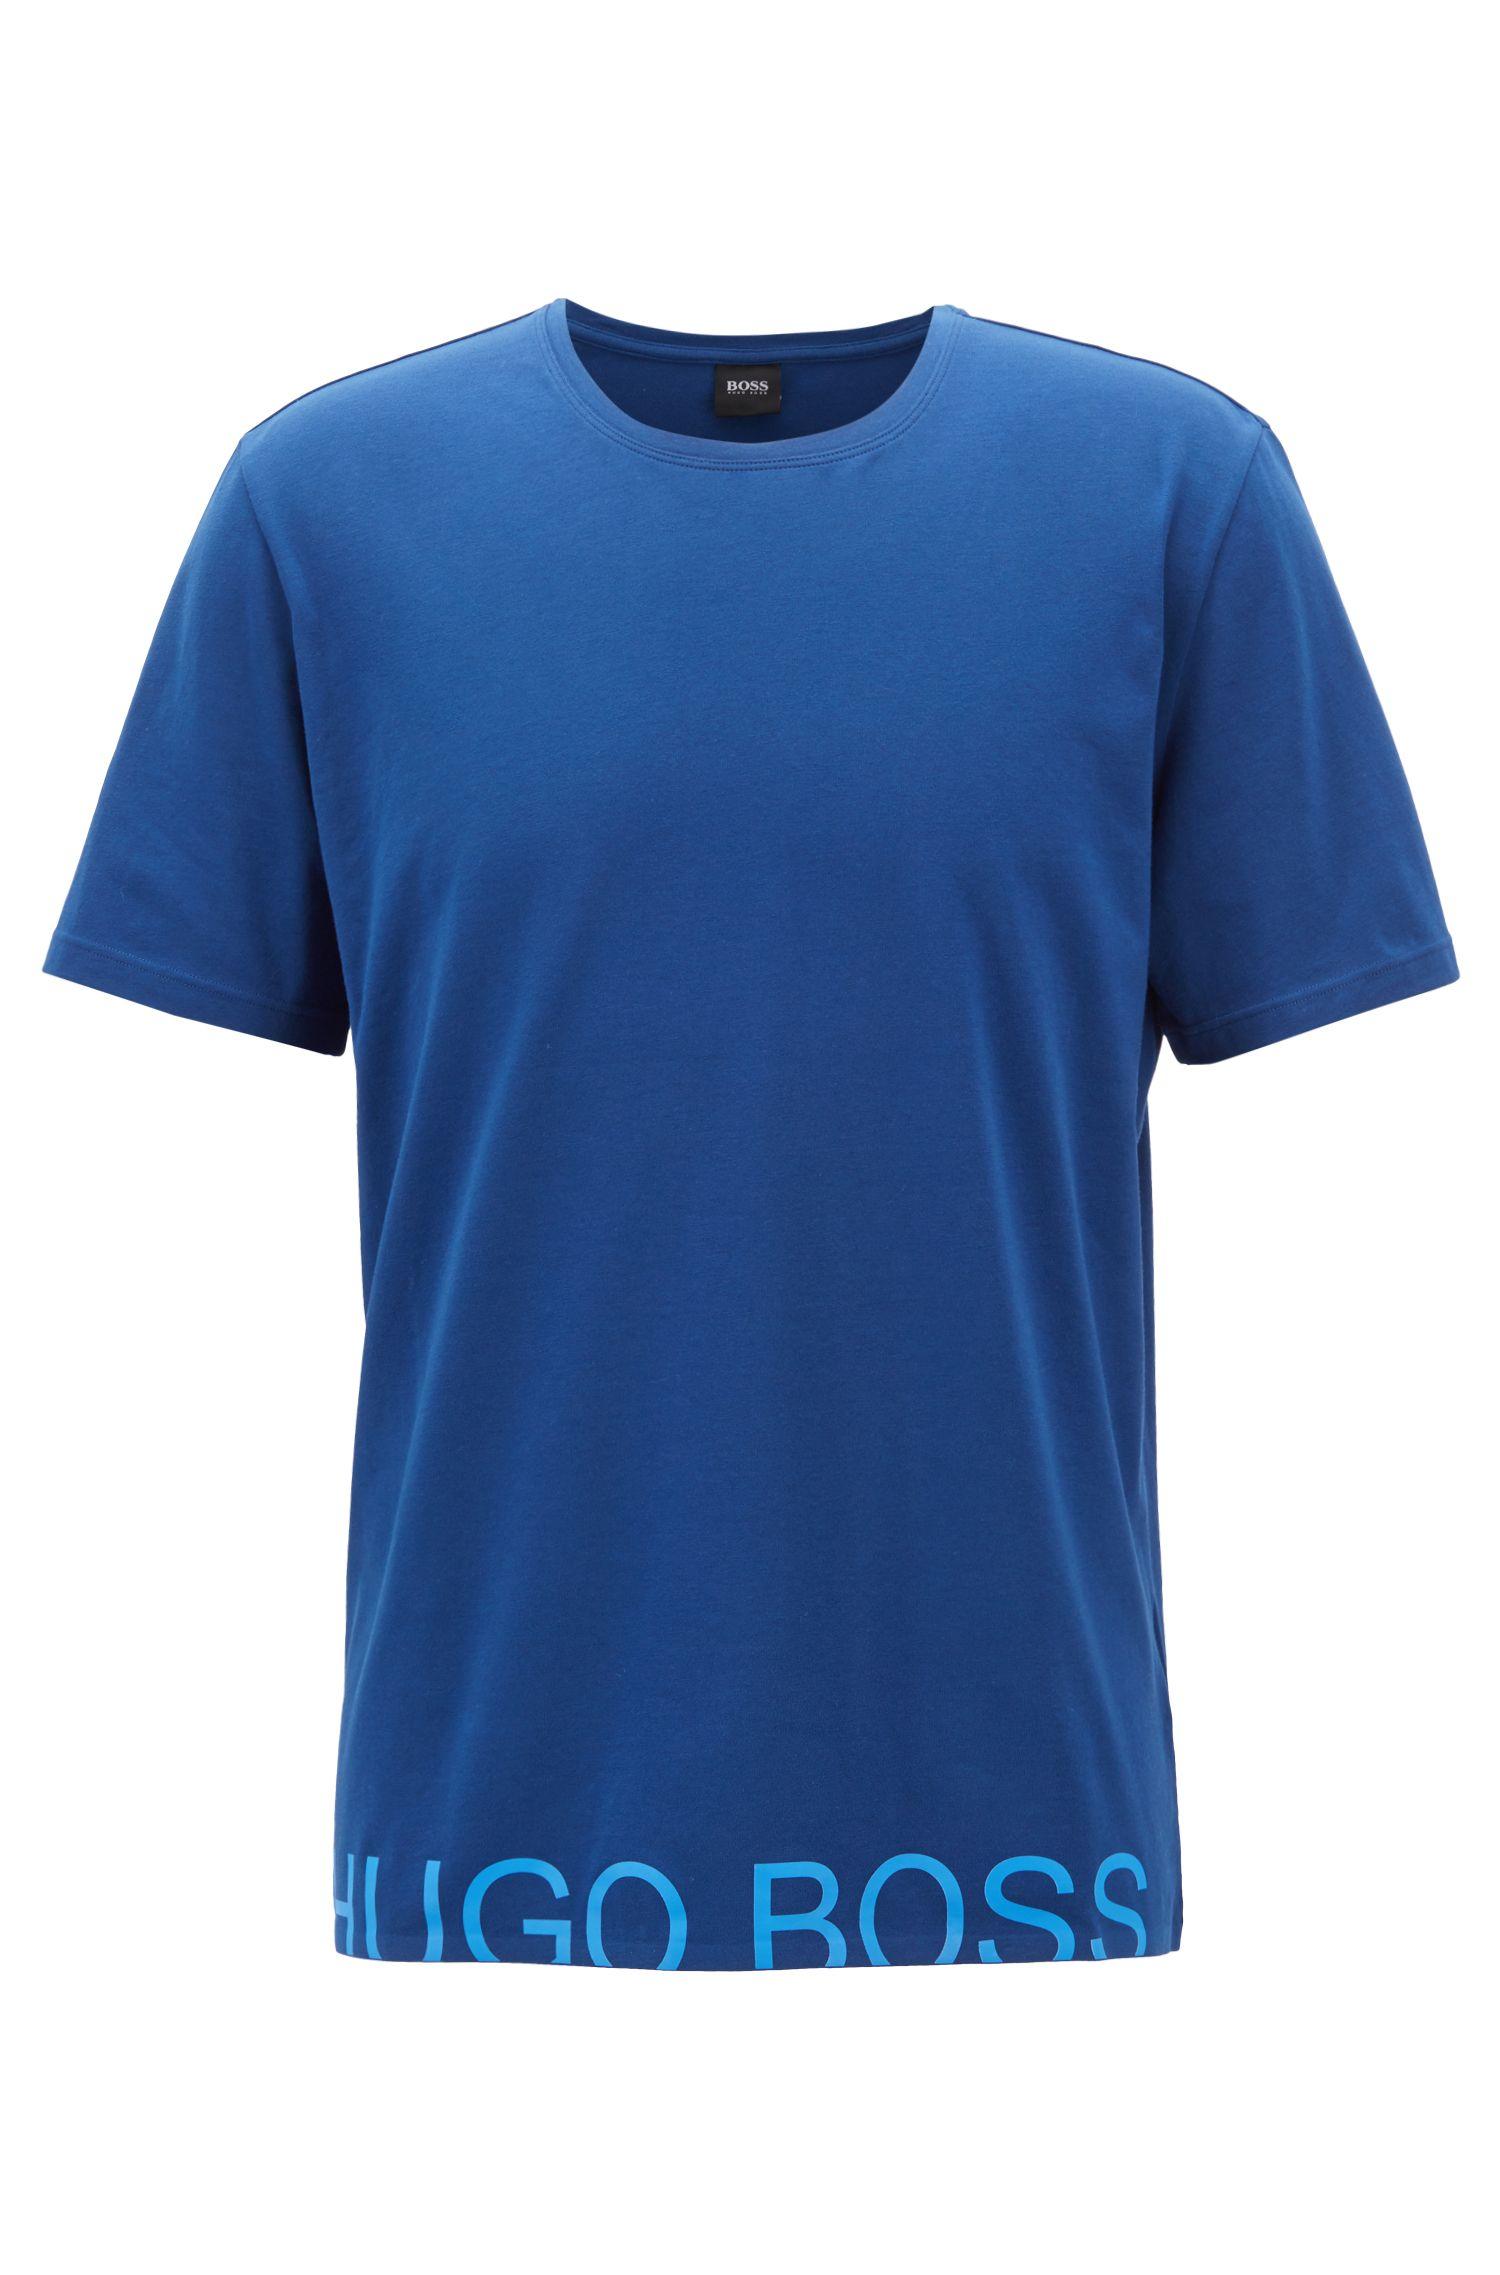 Camiseta de pijama en punto sencillo con logo truncado, Azul